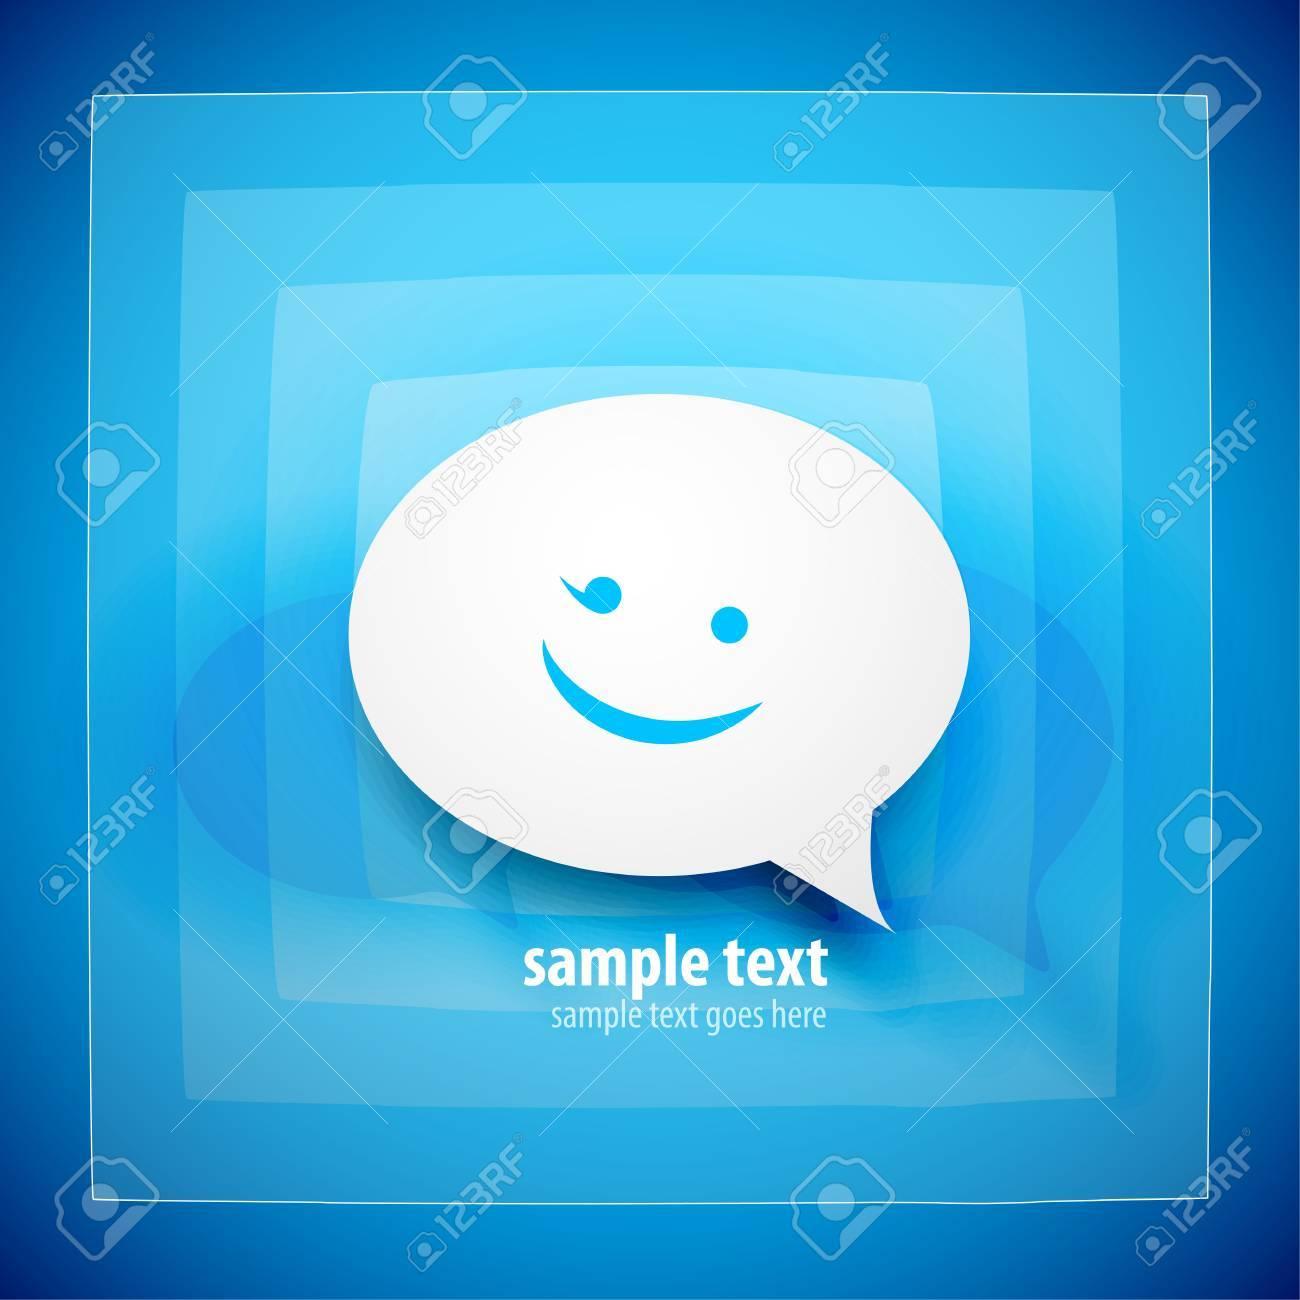 Blue speech bubble background Stock Photo - 12501866